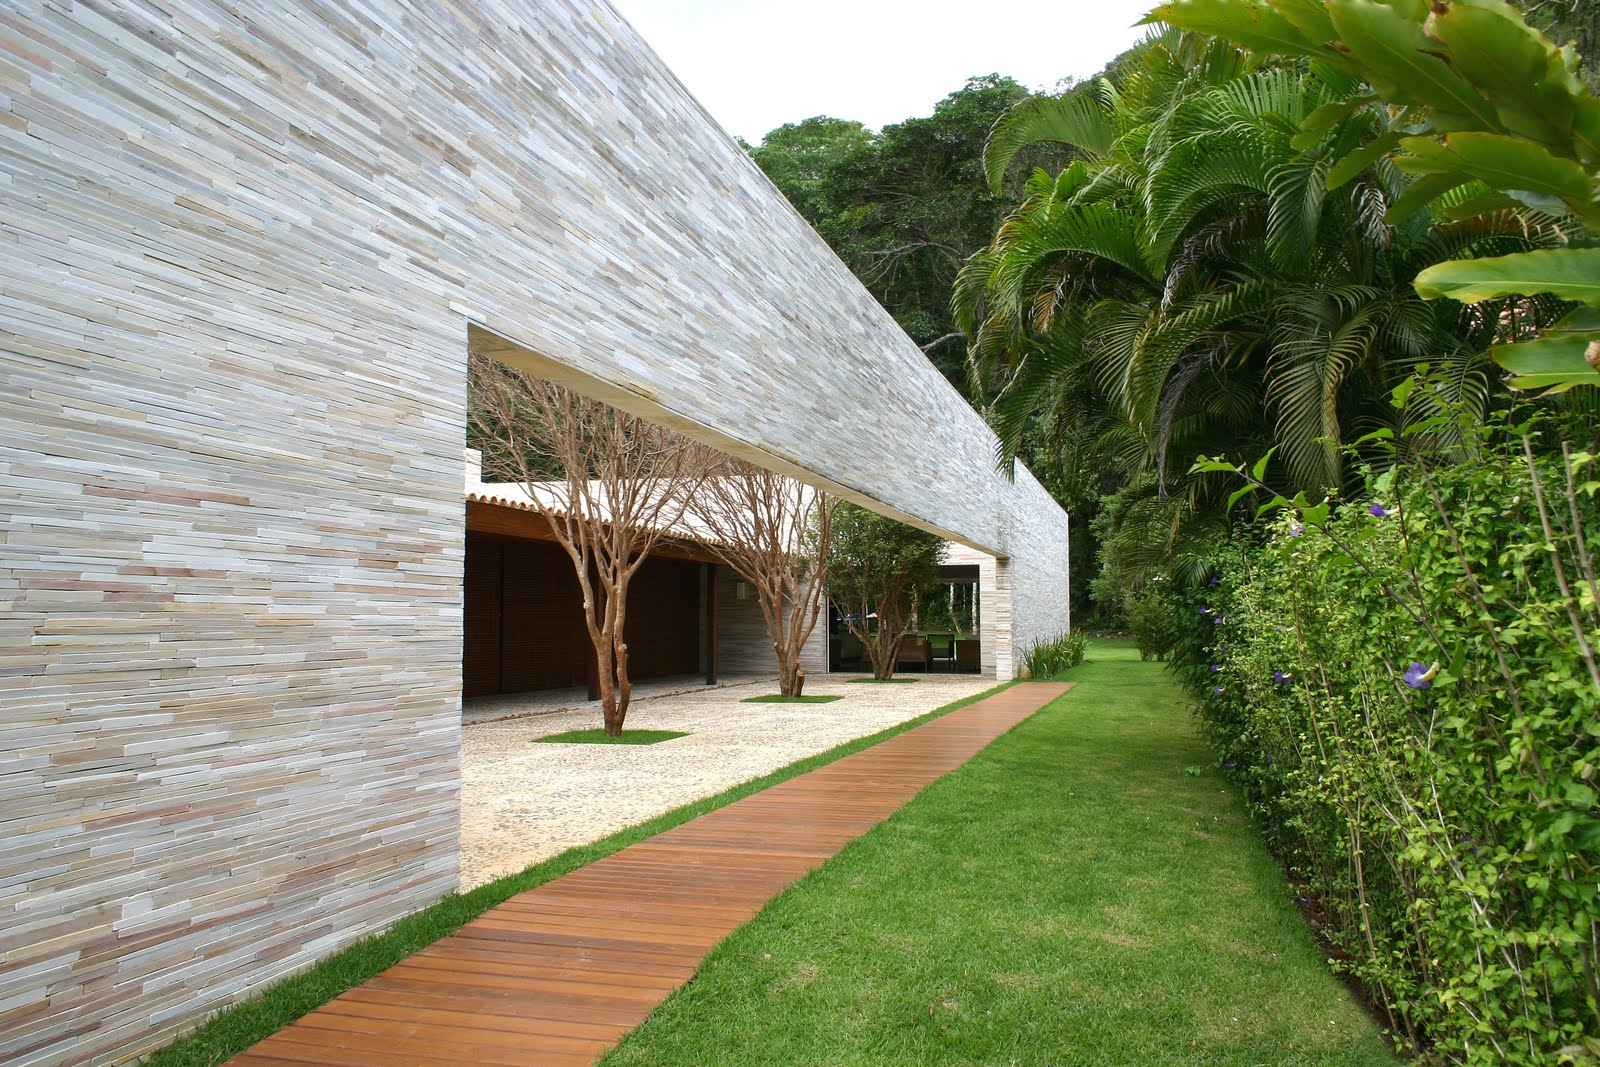 Casa du plessis de mk27 revista arquitectura y dise o for Casa jardin 8 de octubre